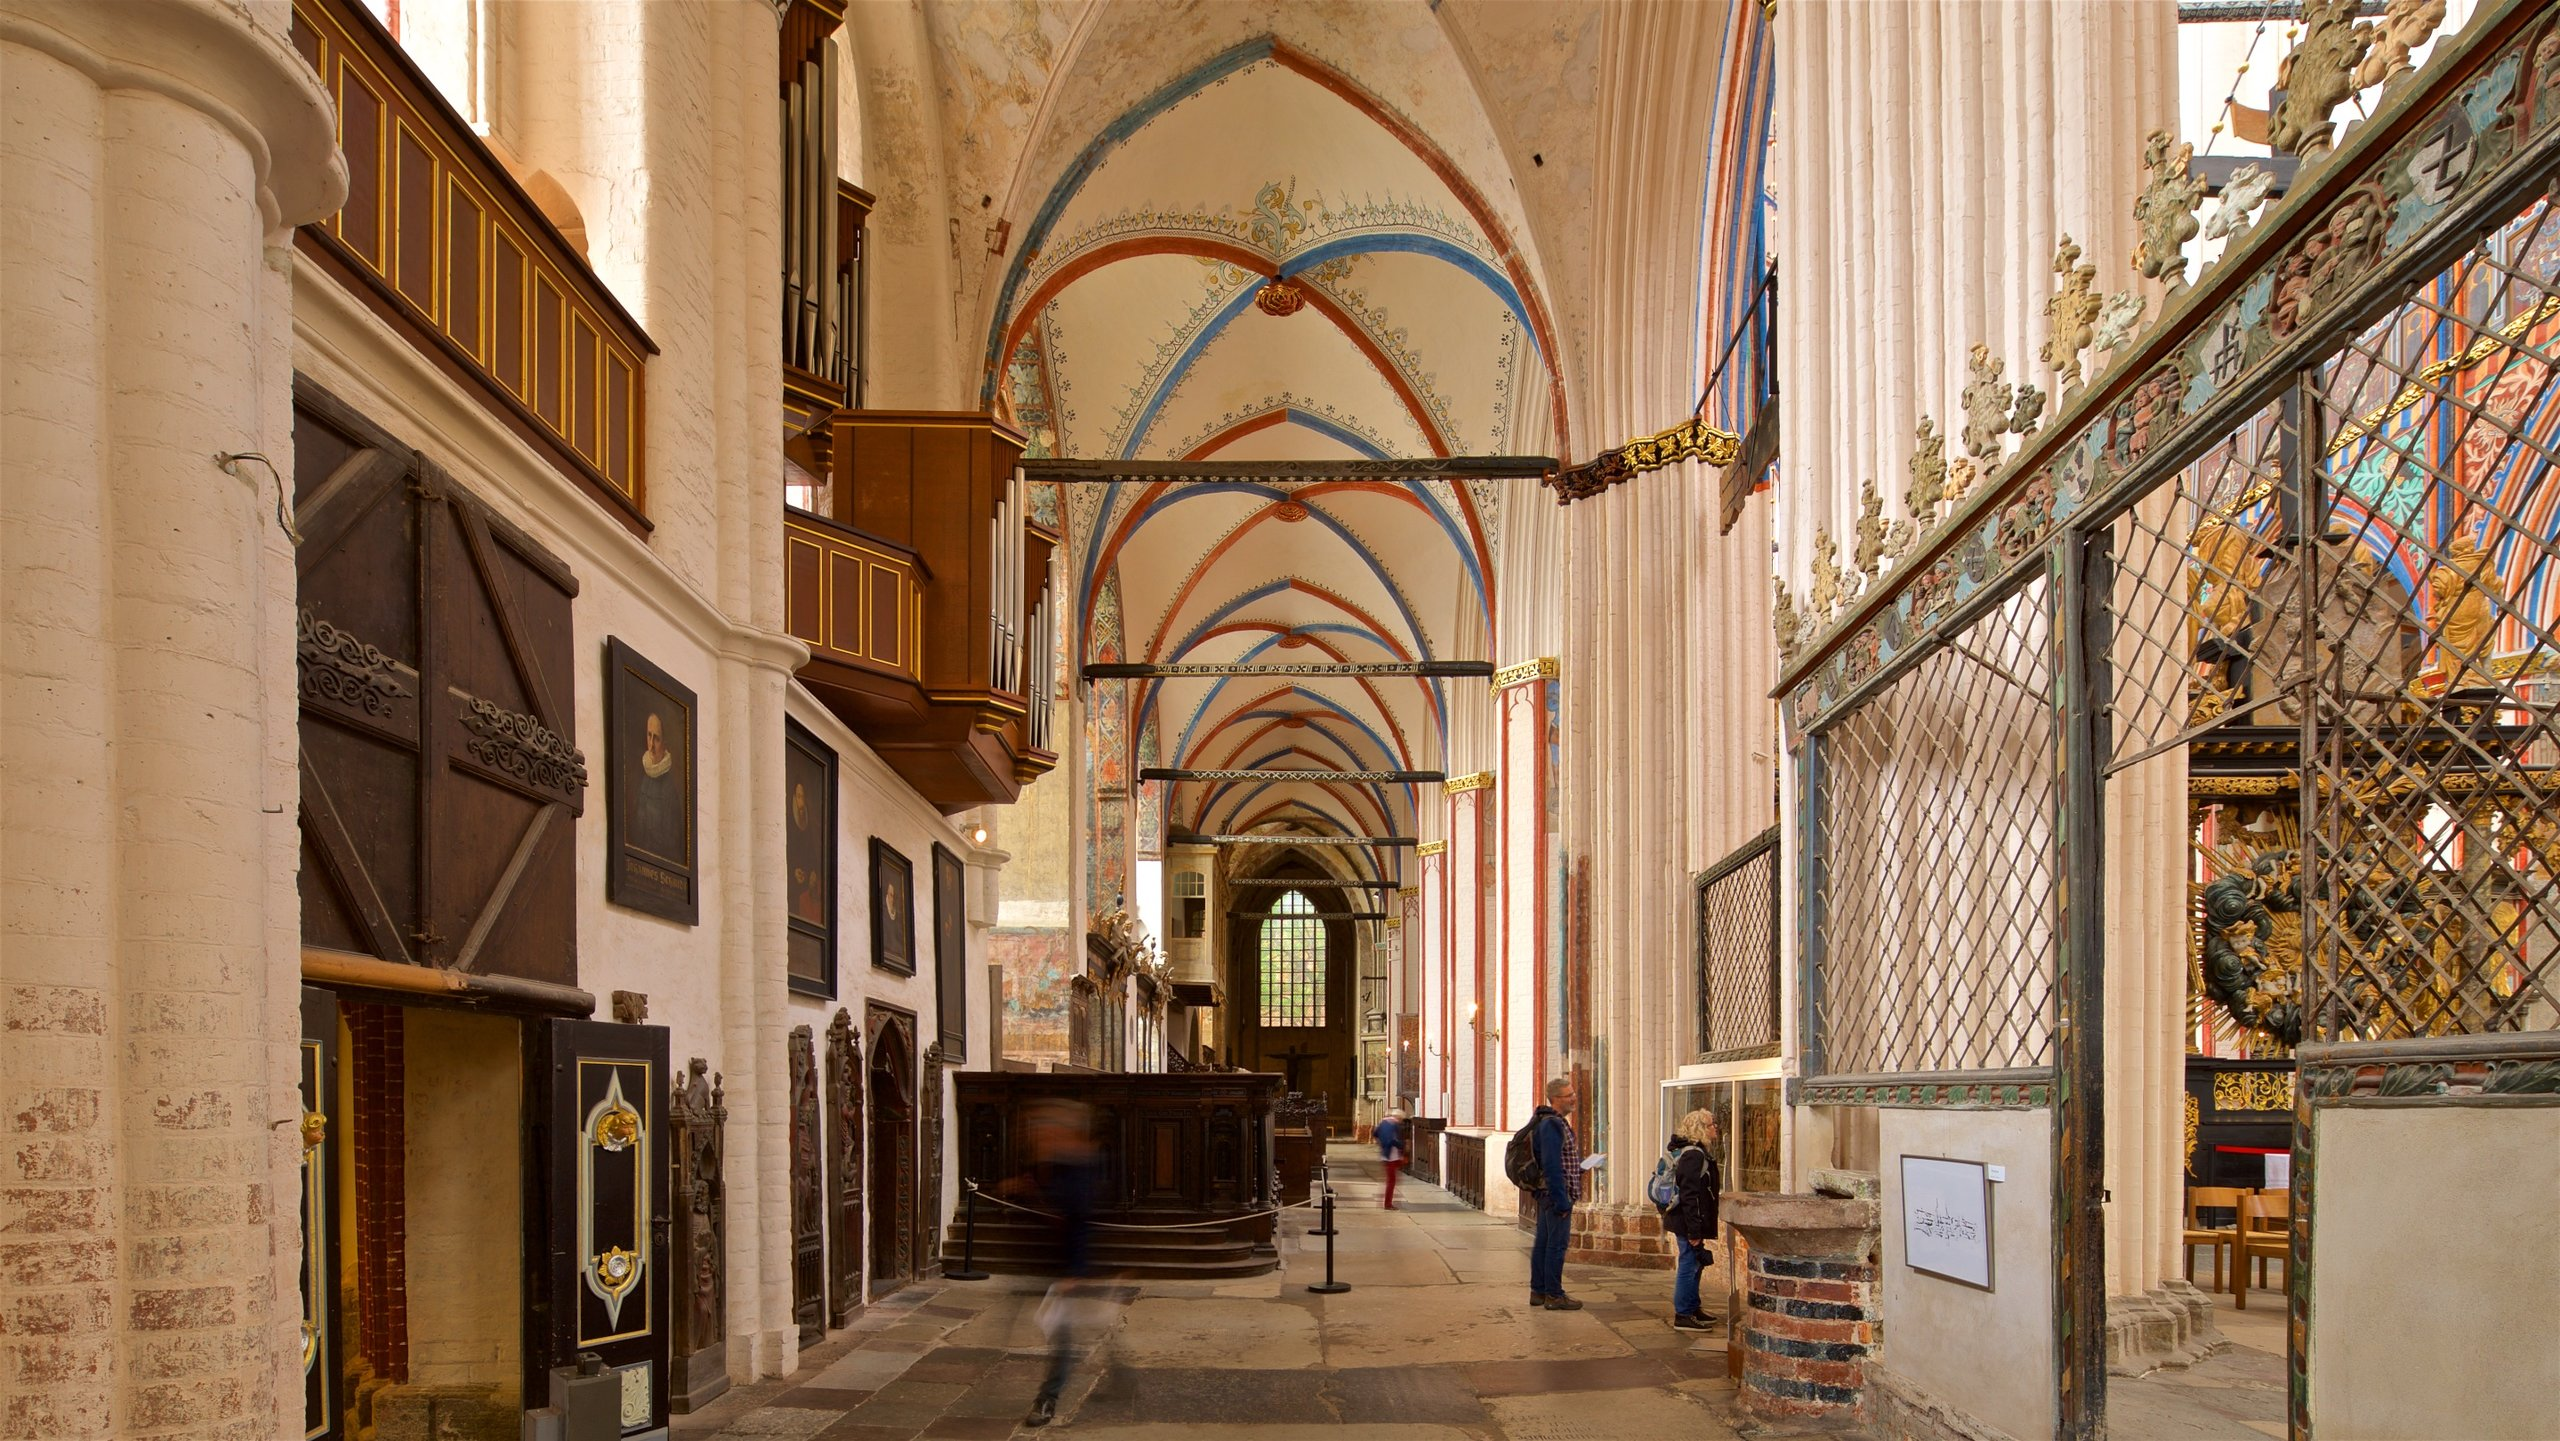 St. Nicholas' Church, Stralsund, Mecklenburg-West Pomerania, Germany